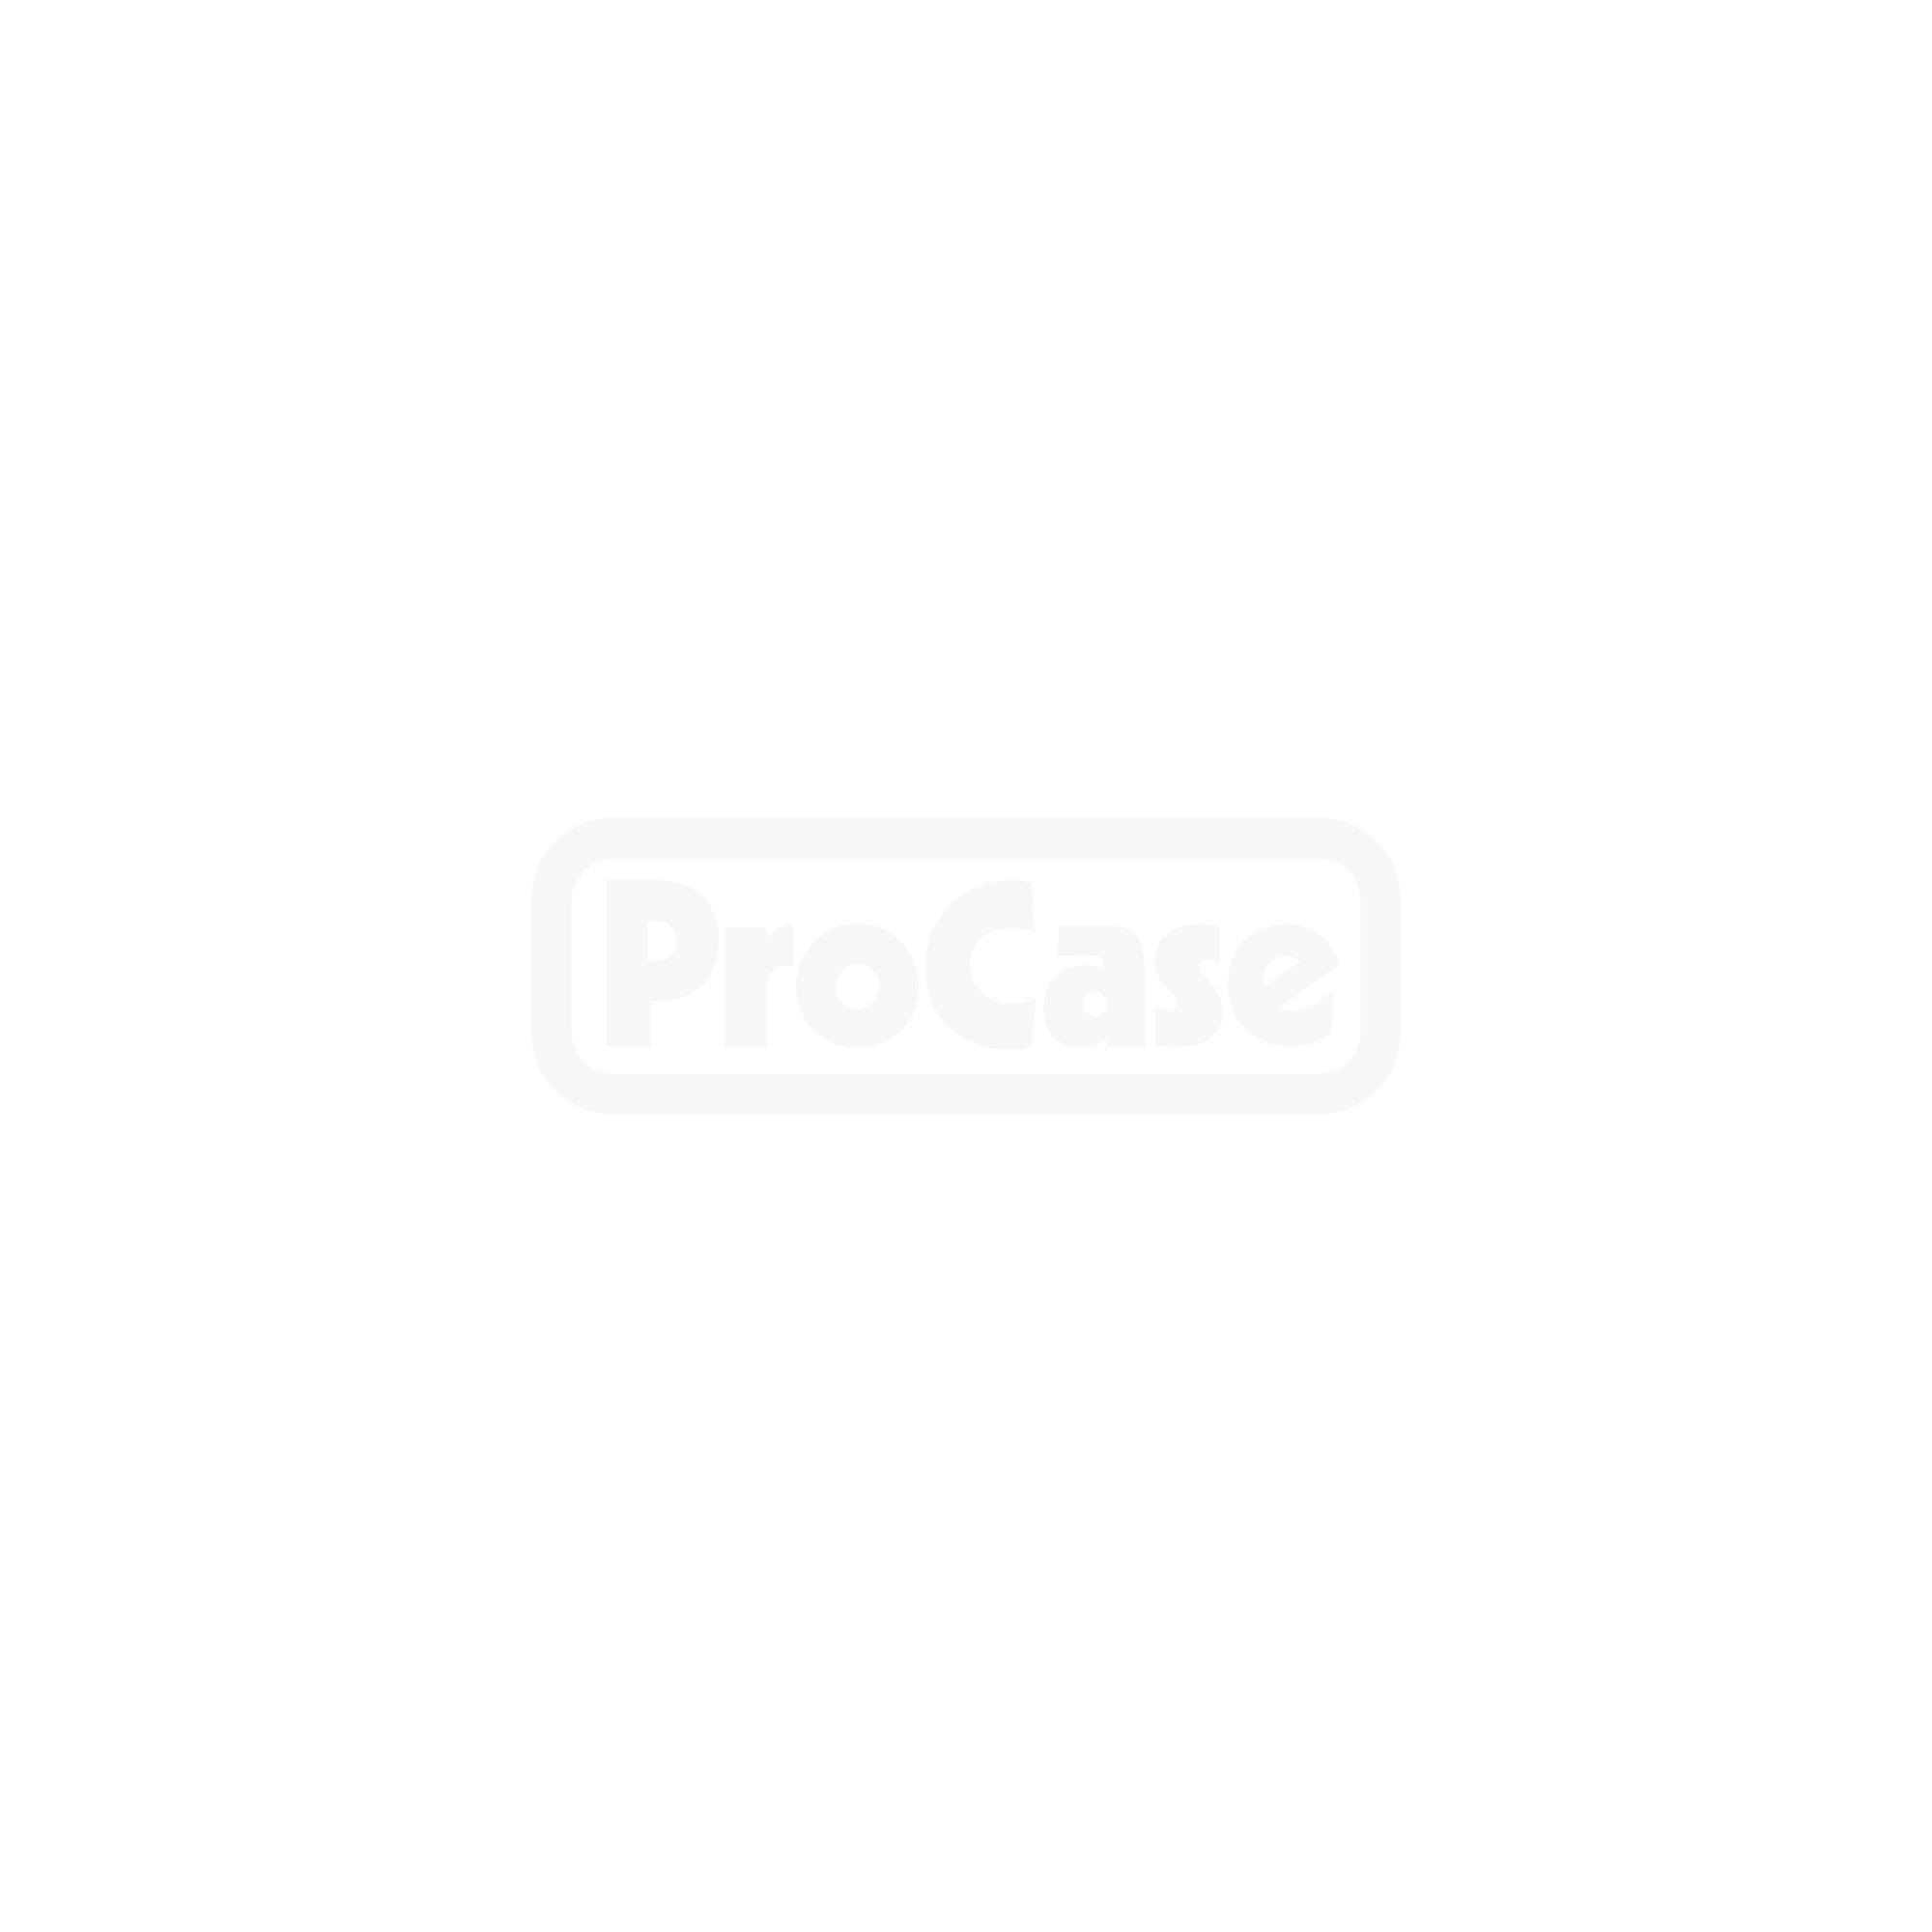 Flightcase für 4x König&Meyer Design Monitorstativ 26785 2